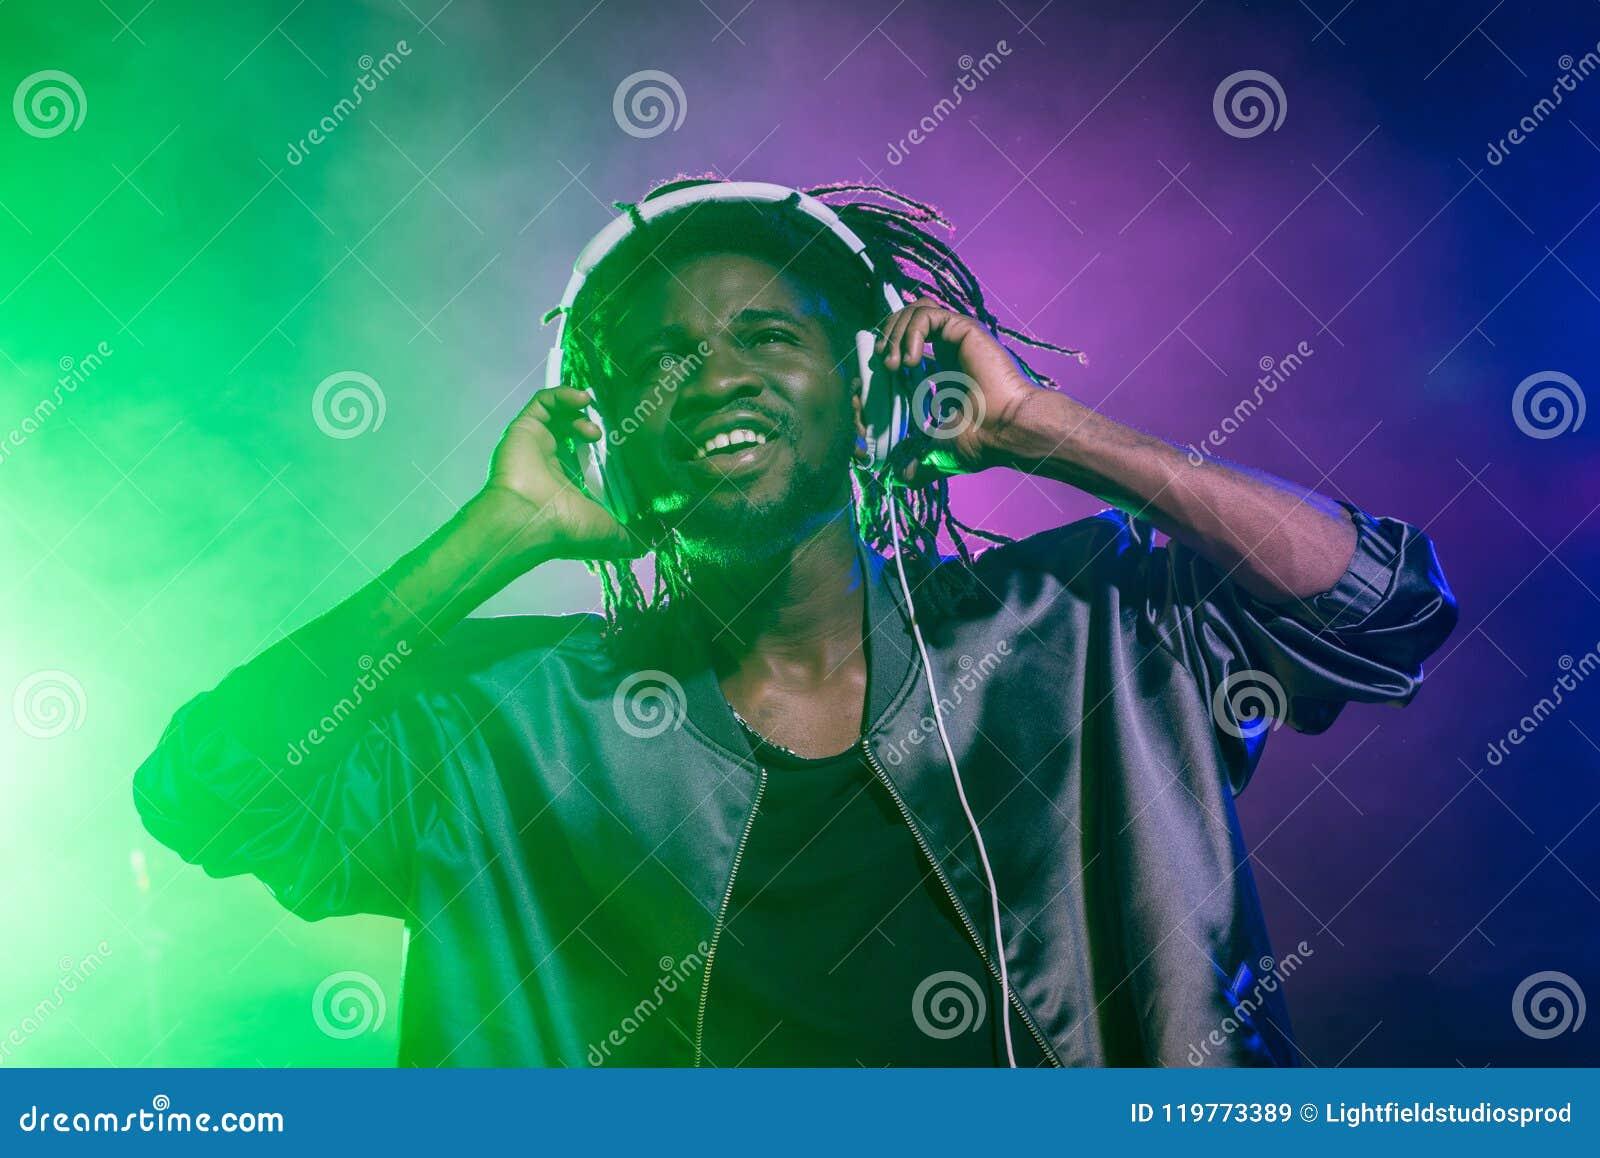 Club afroamericano profesional DJ en auriculares